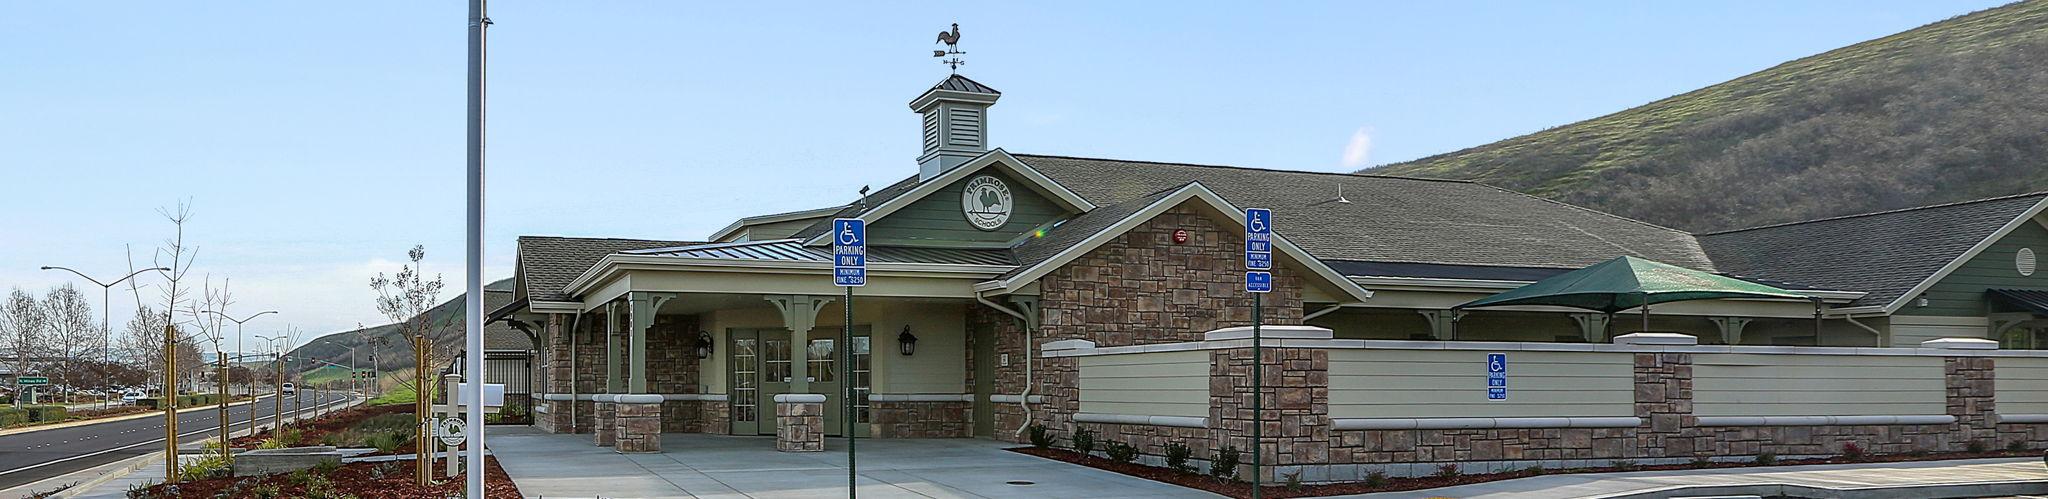 exterior image of Primrose School of Livermore